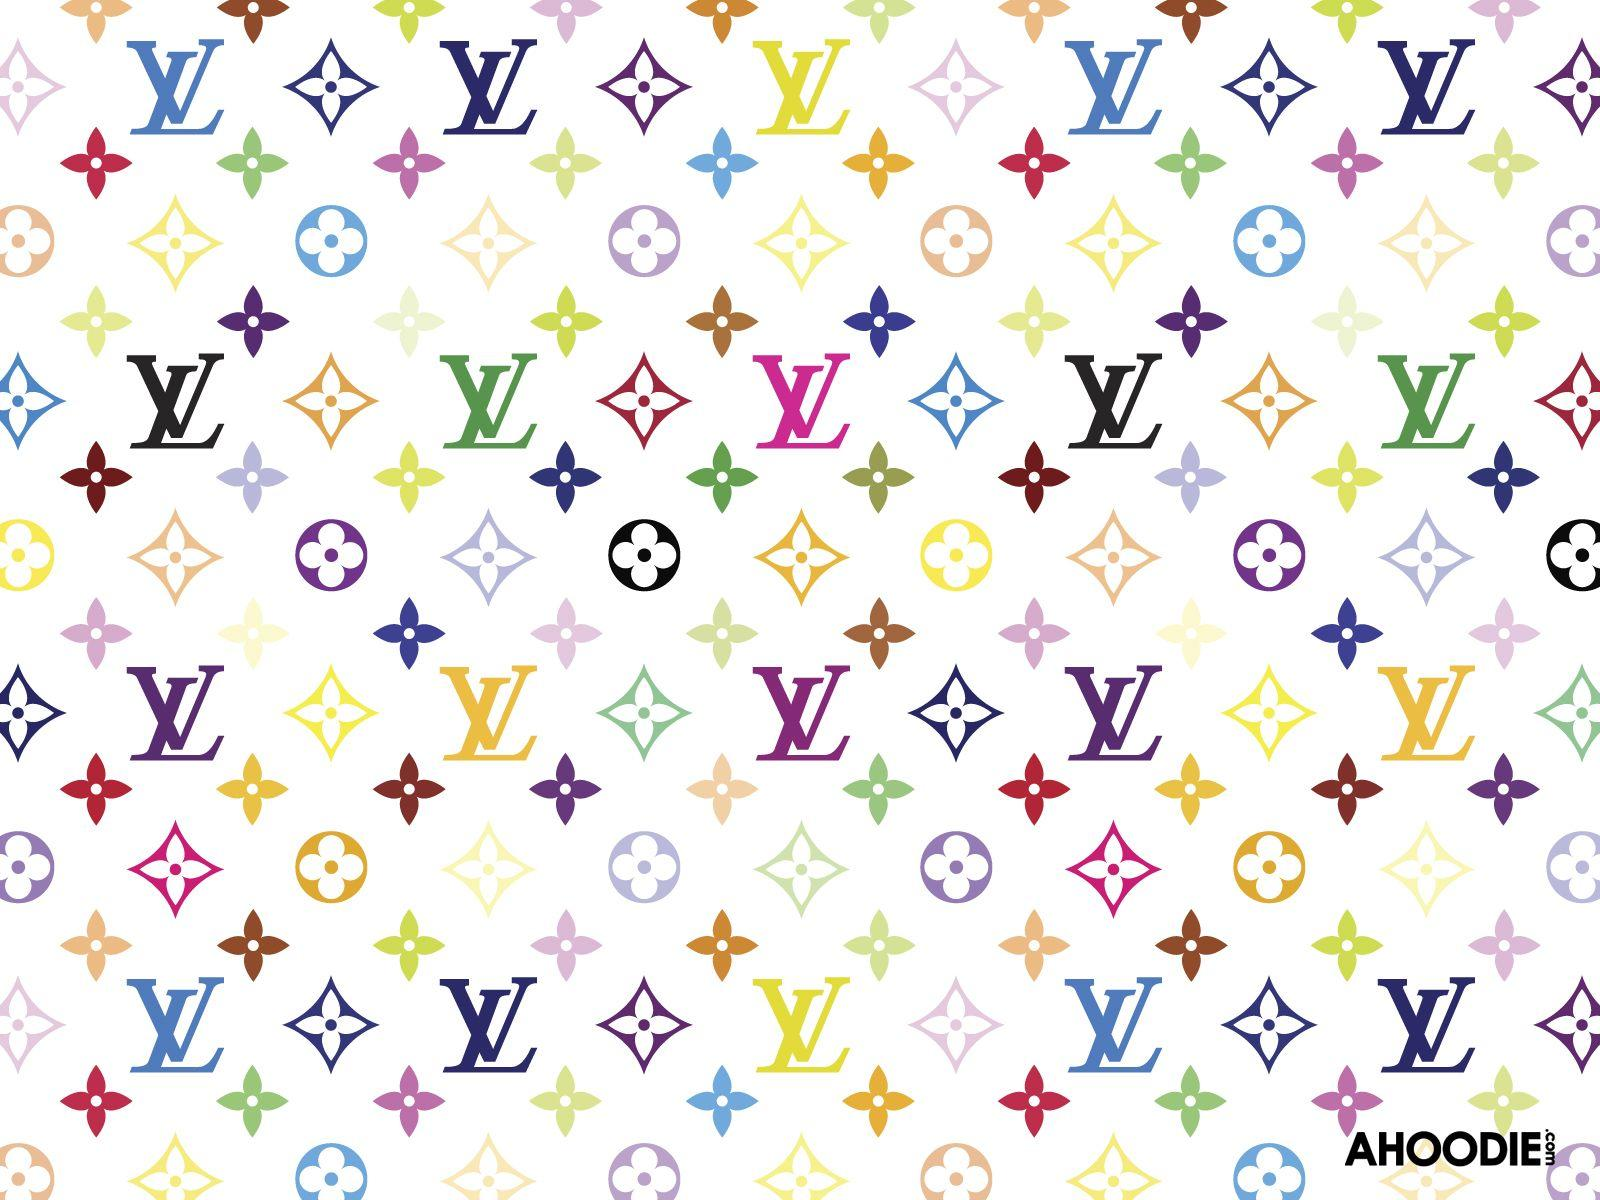 Louis Vuitton Wallpapers - Wallpaper Cave